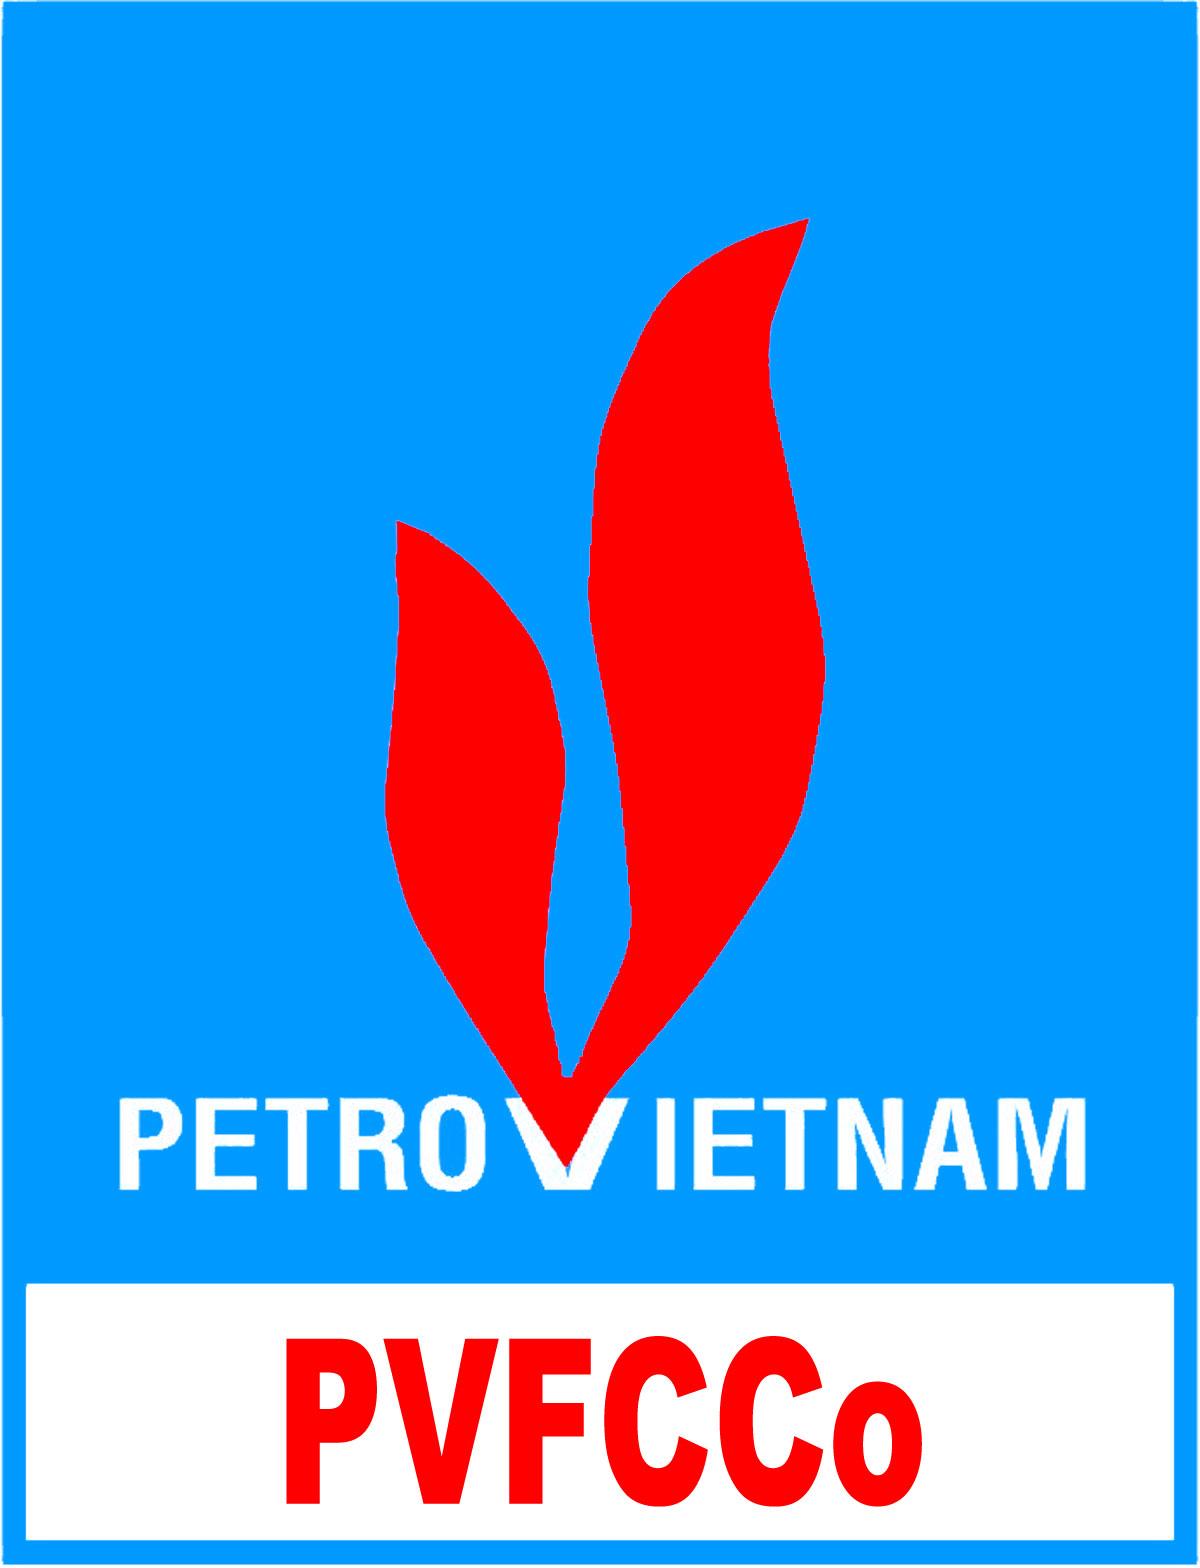 Dpm   Petrovietnam Fertilizer U0026 Chemicals Corporation   Pvfcco   Vietstockfinance - Petrovietnam, Transparent background PNG HD thumbnail